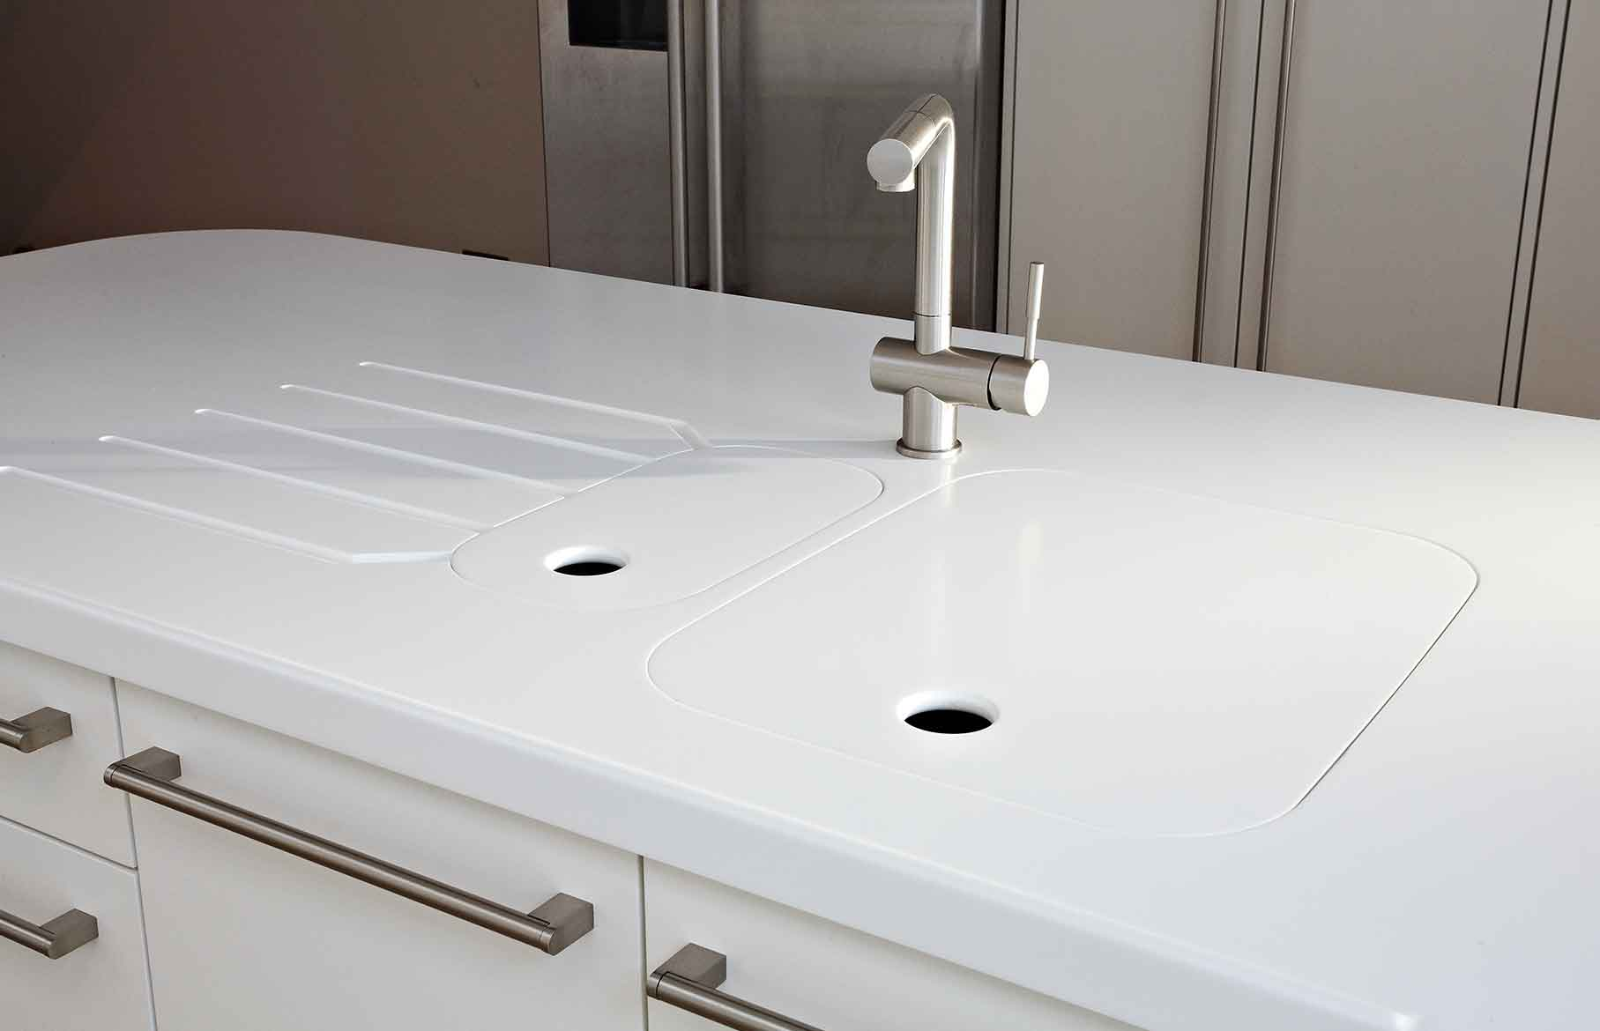 Pure bespoke contemporary kitchen sink